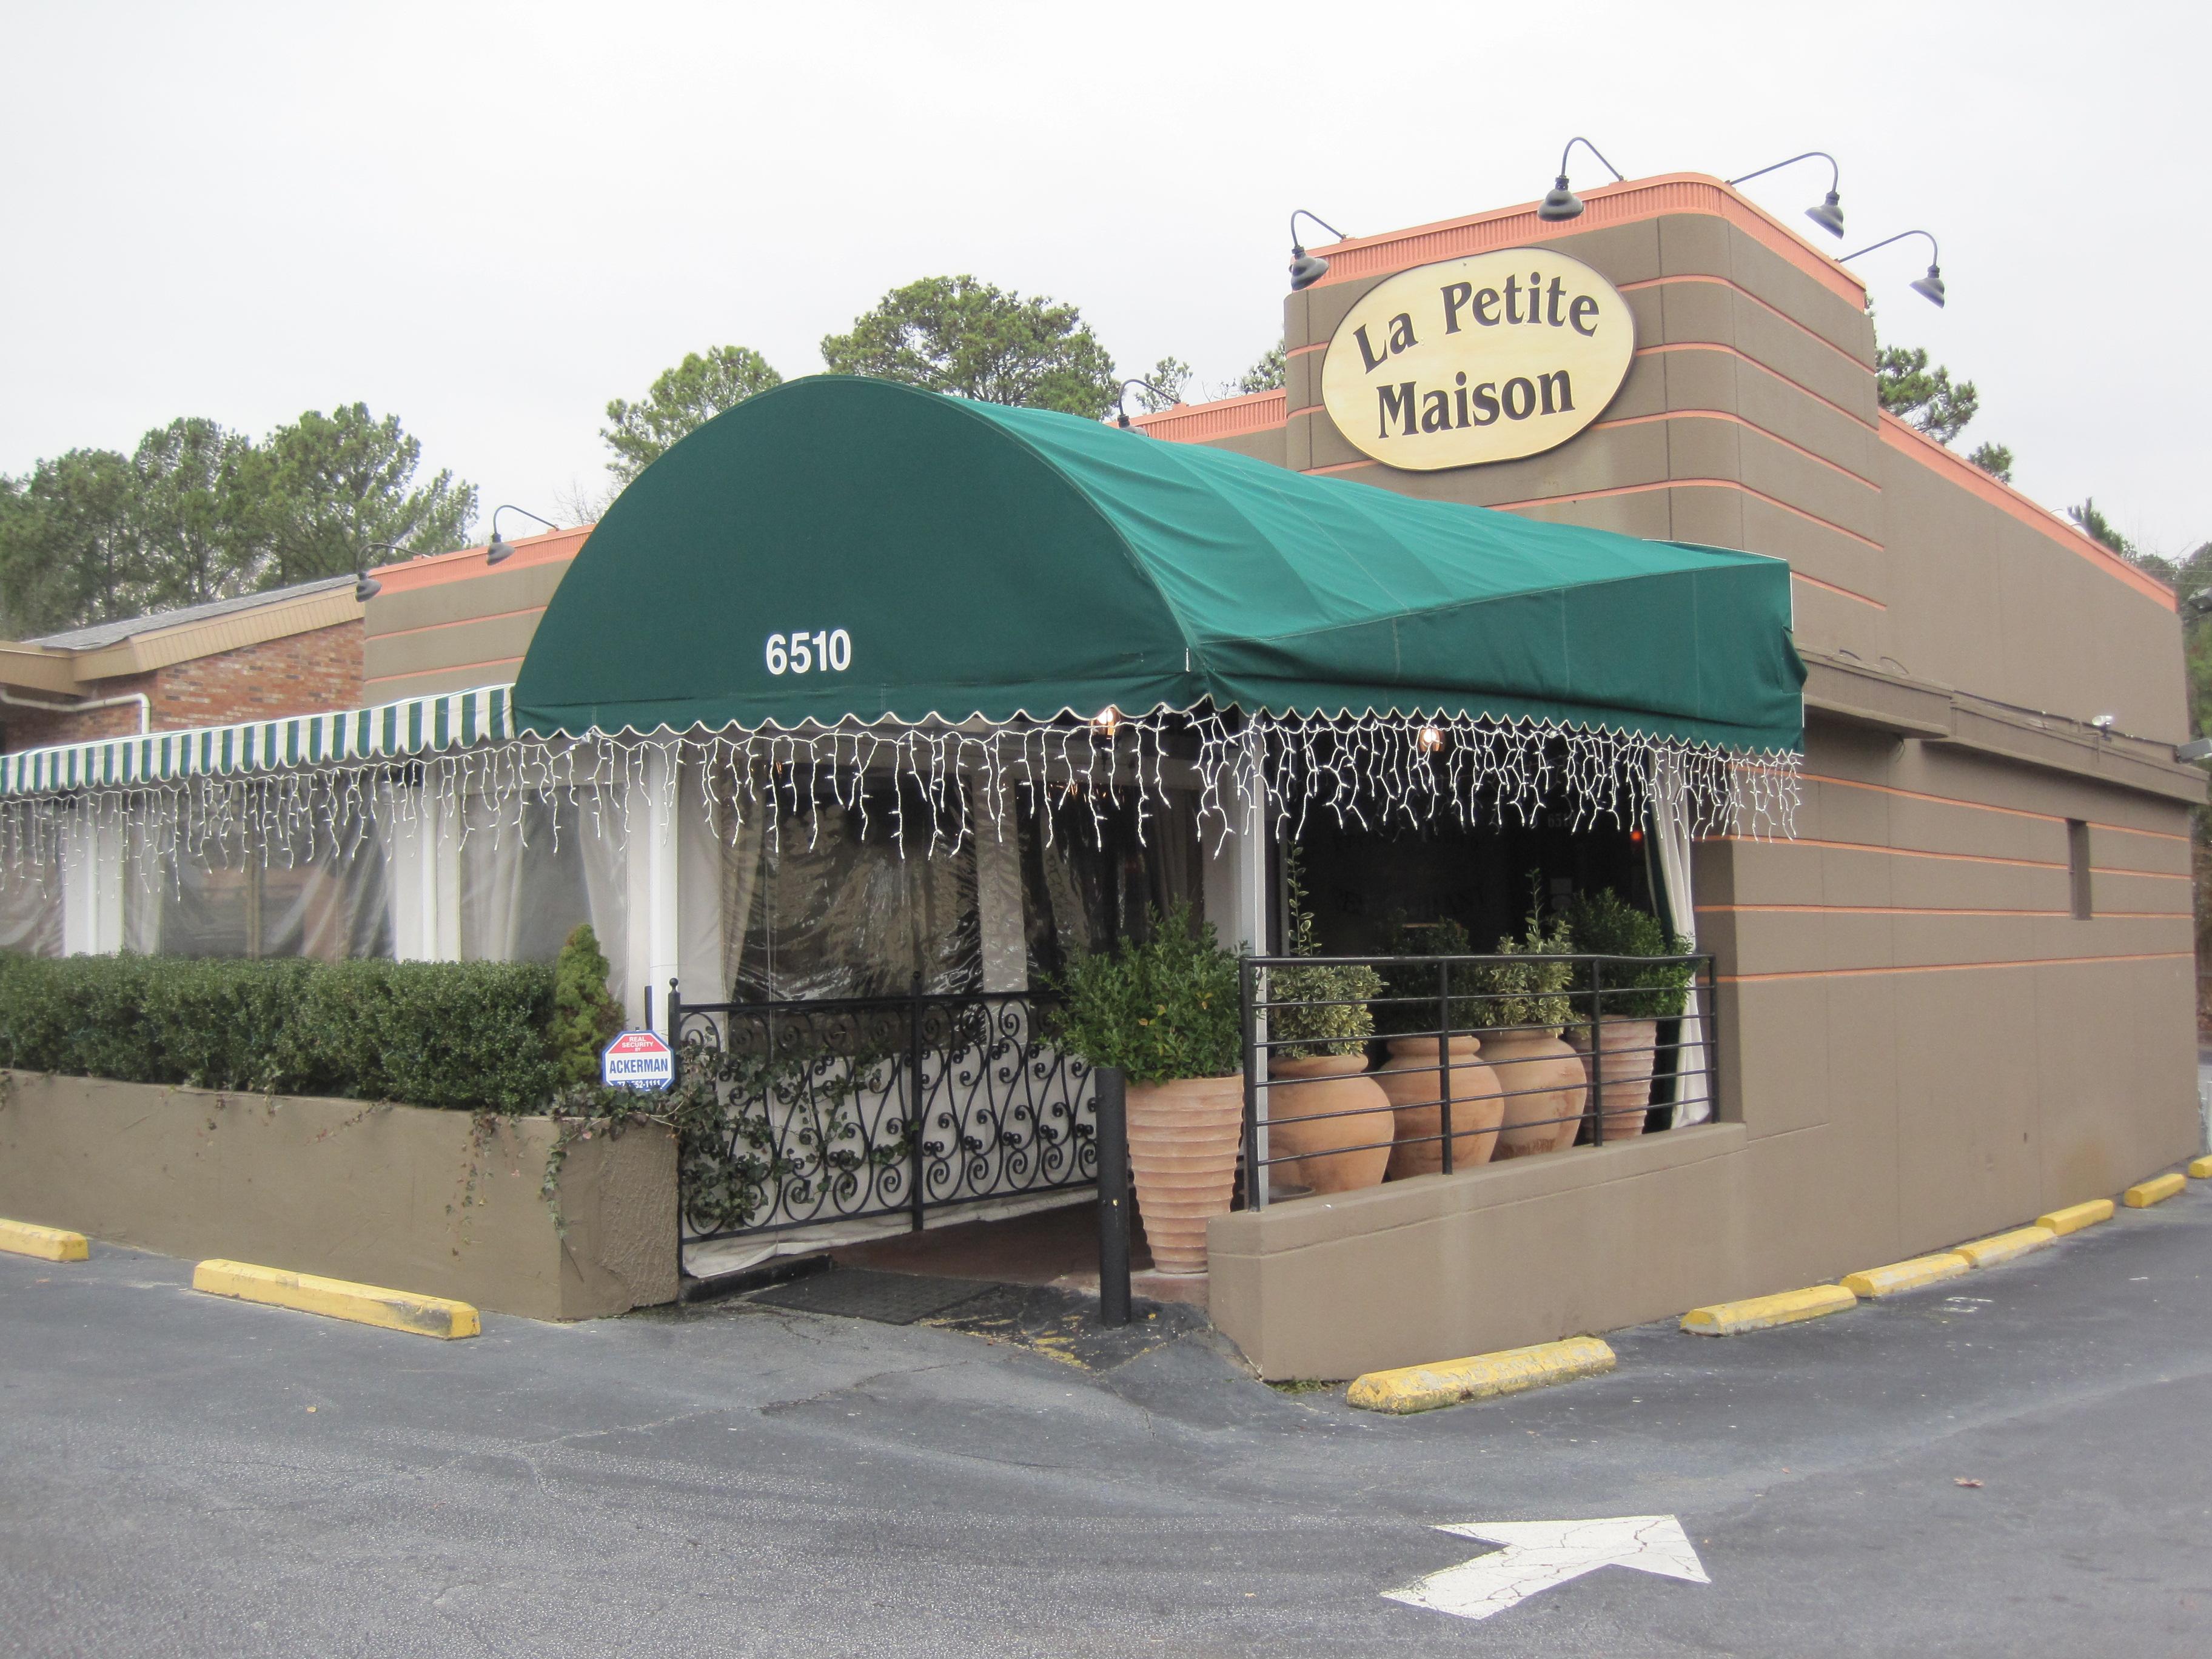 La Petite Maison Atlanta yugen at la petite maison, sandy springs ga | food near